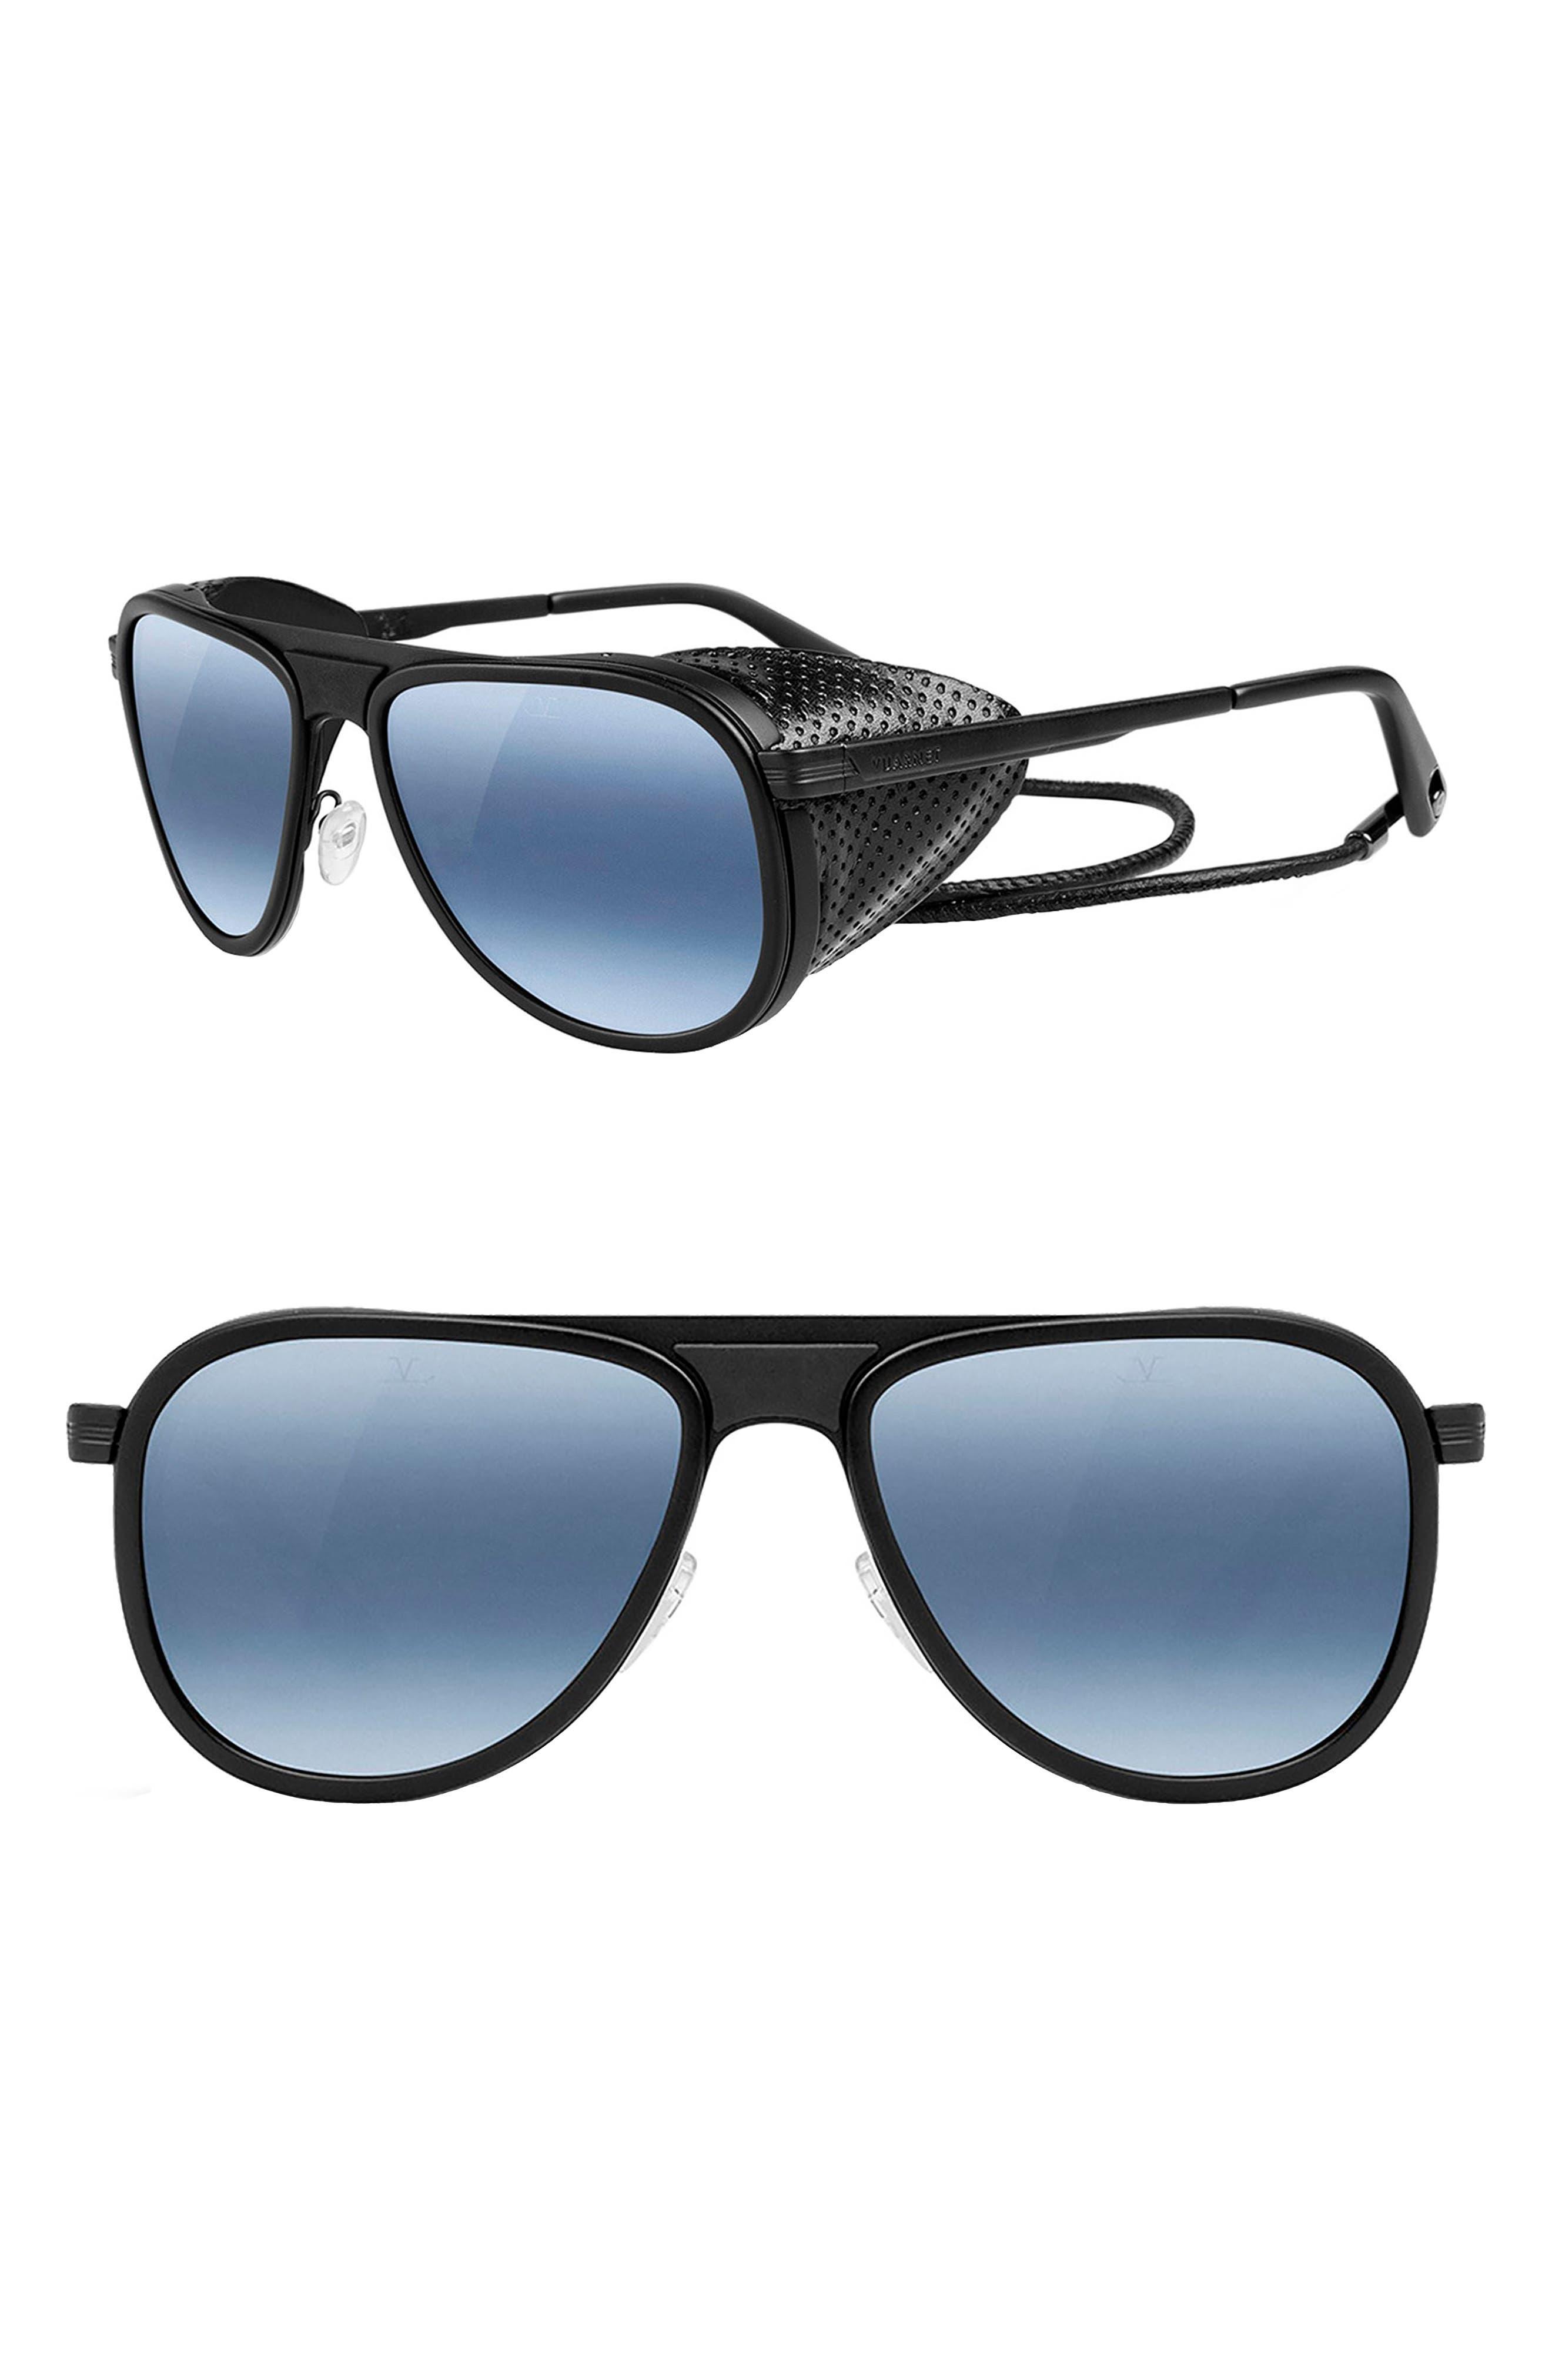 Glacier 57mm Aviator Sunglasses,                             Main thumbnail 1, color,                             MATT BLACK/ BLUE POLAR LYNX